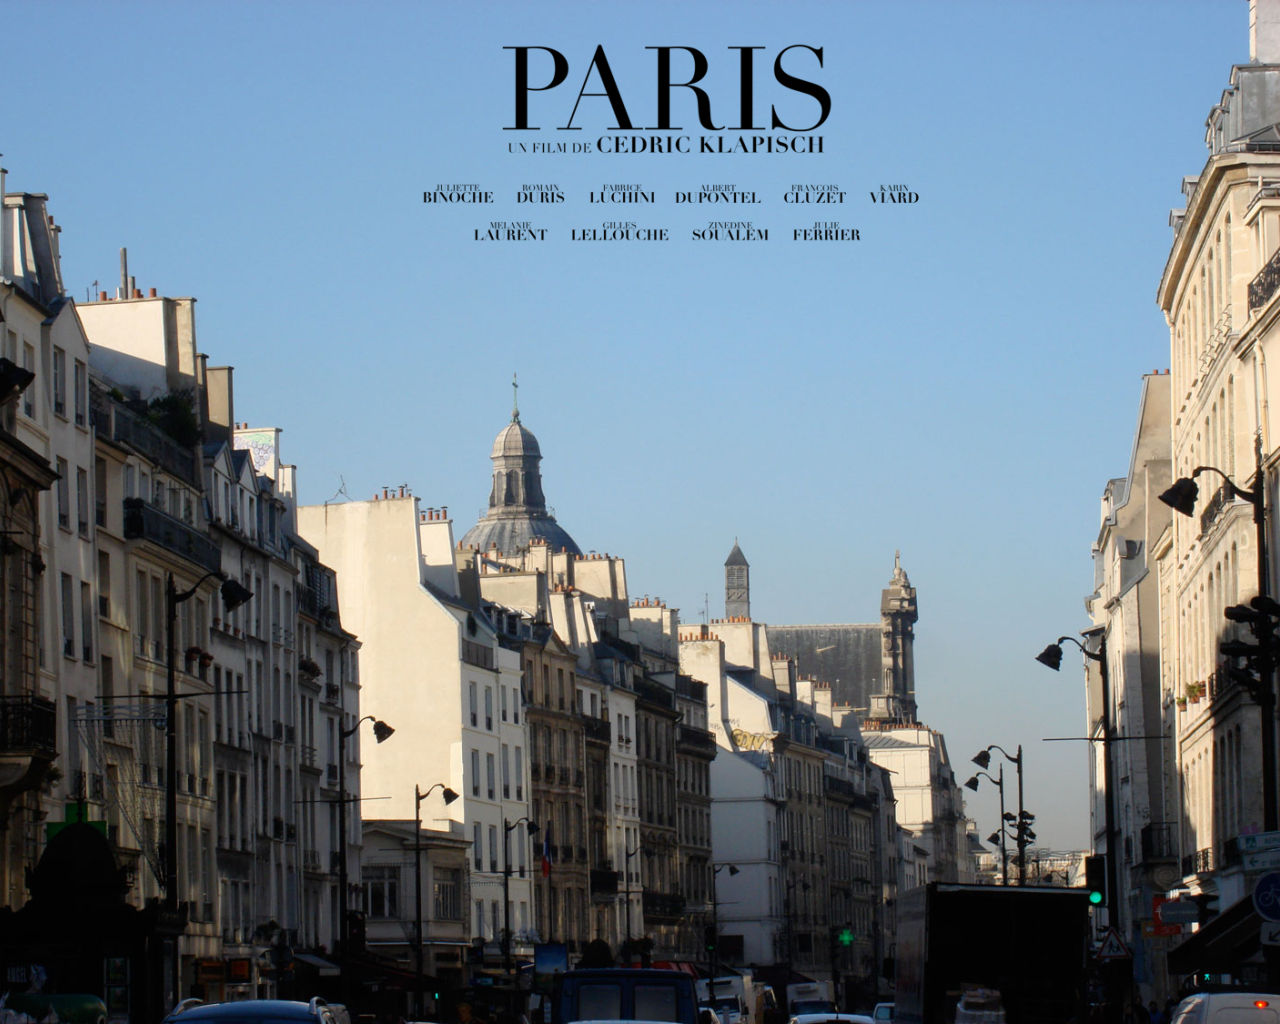 Wallpaper download paris - Paris Wallpaper Free Download Wallpaper